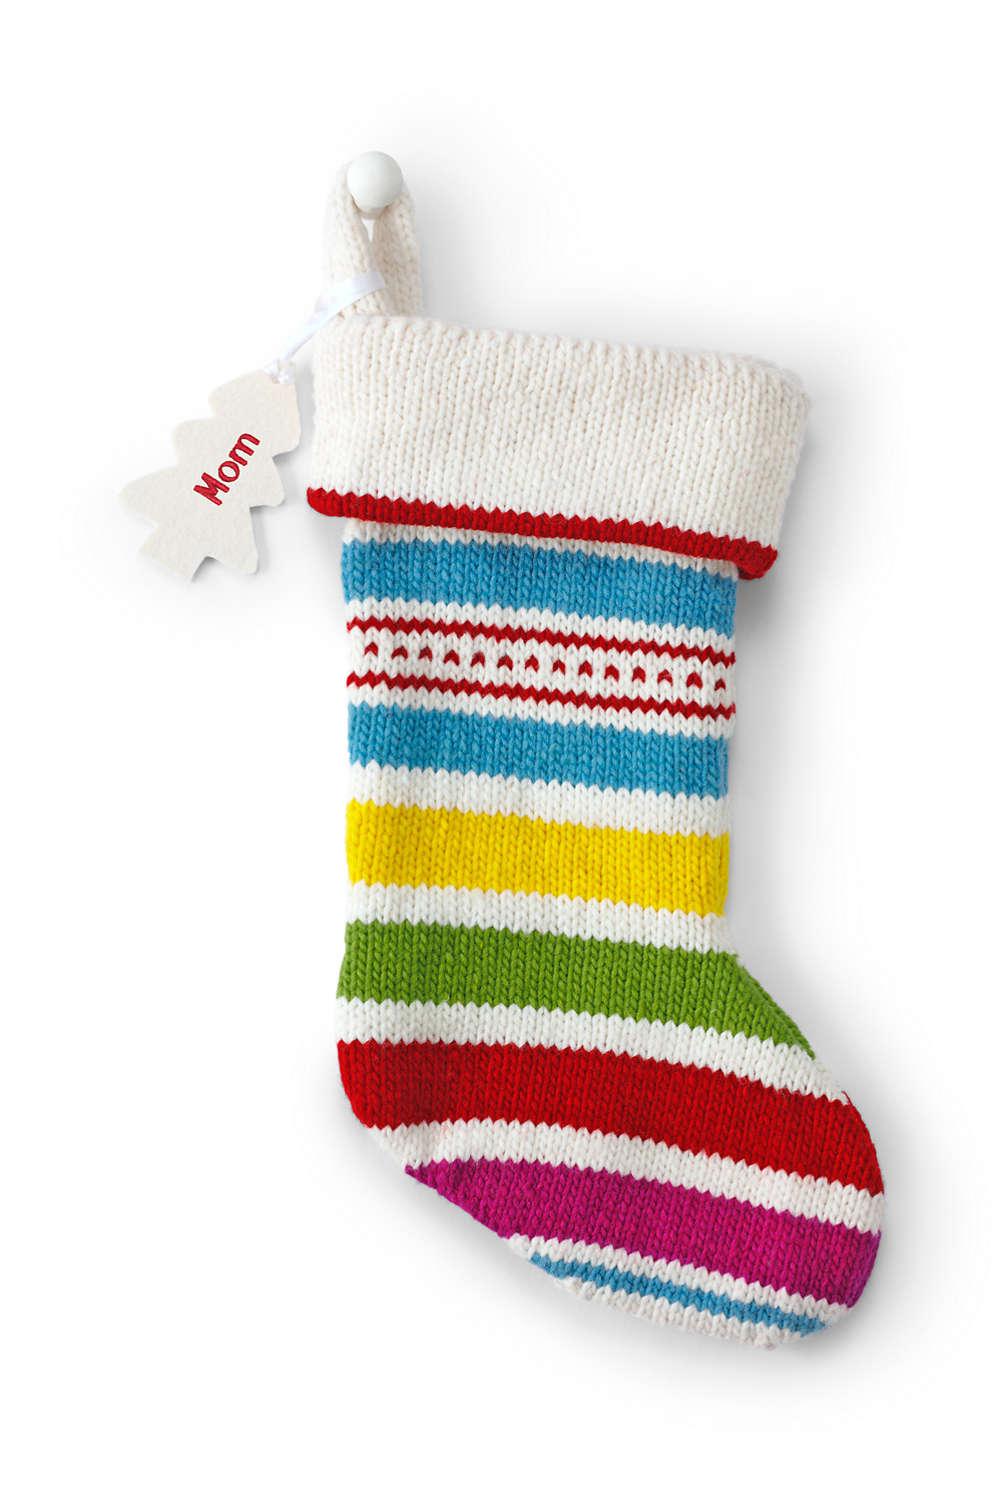 Knit Christmas Stockings.Knit Christmas Stocking